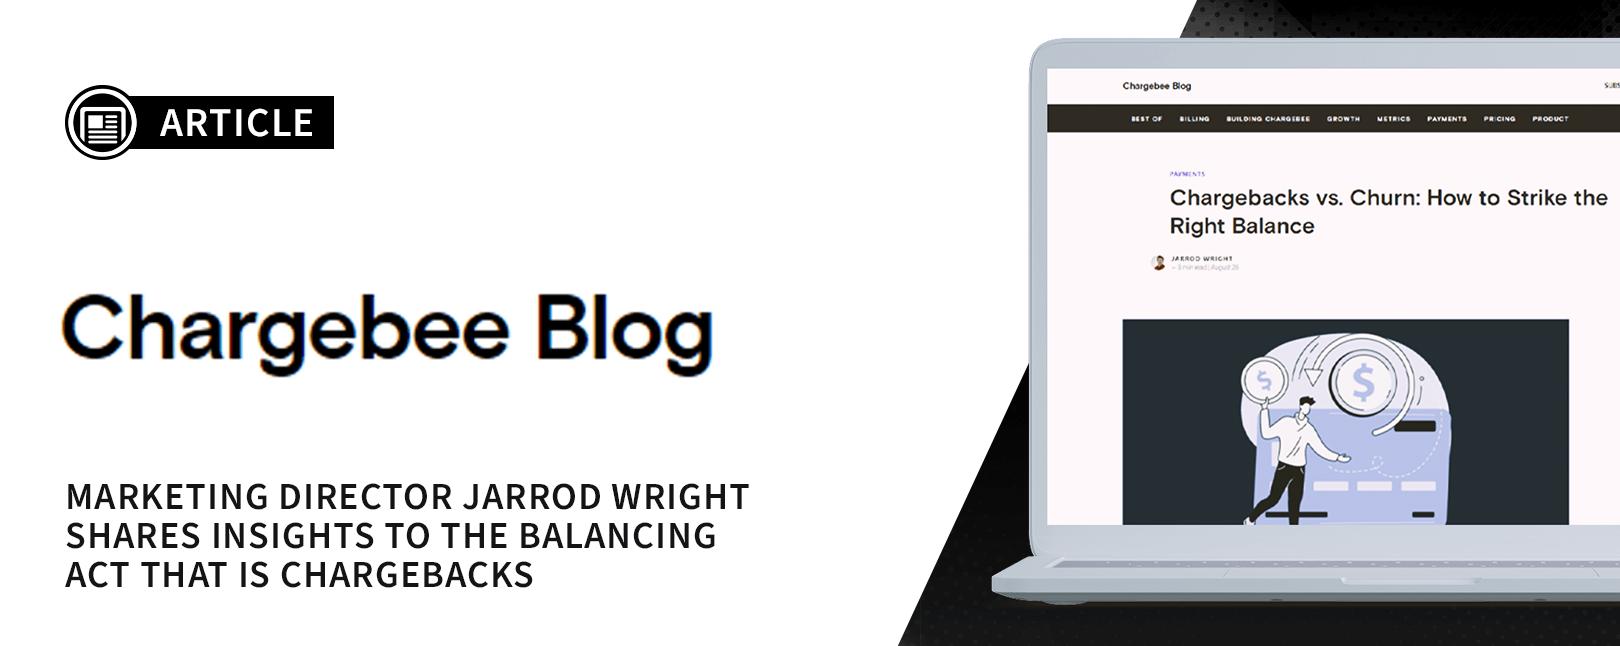 Chargebacks vs. Churn: How to Strike the Right Balance